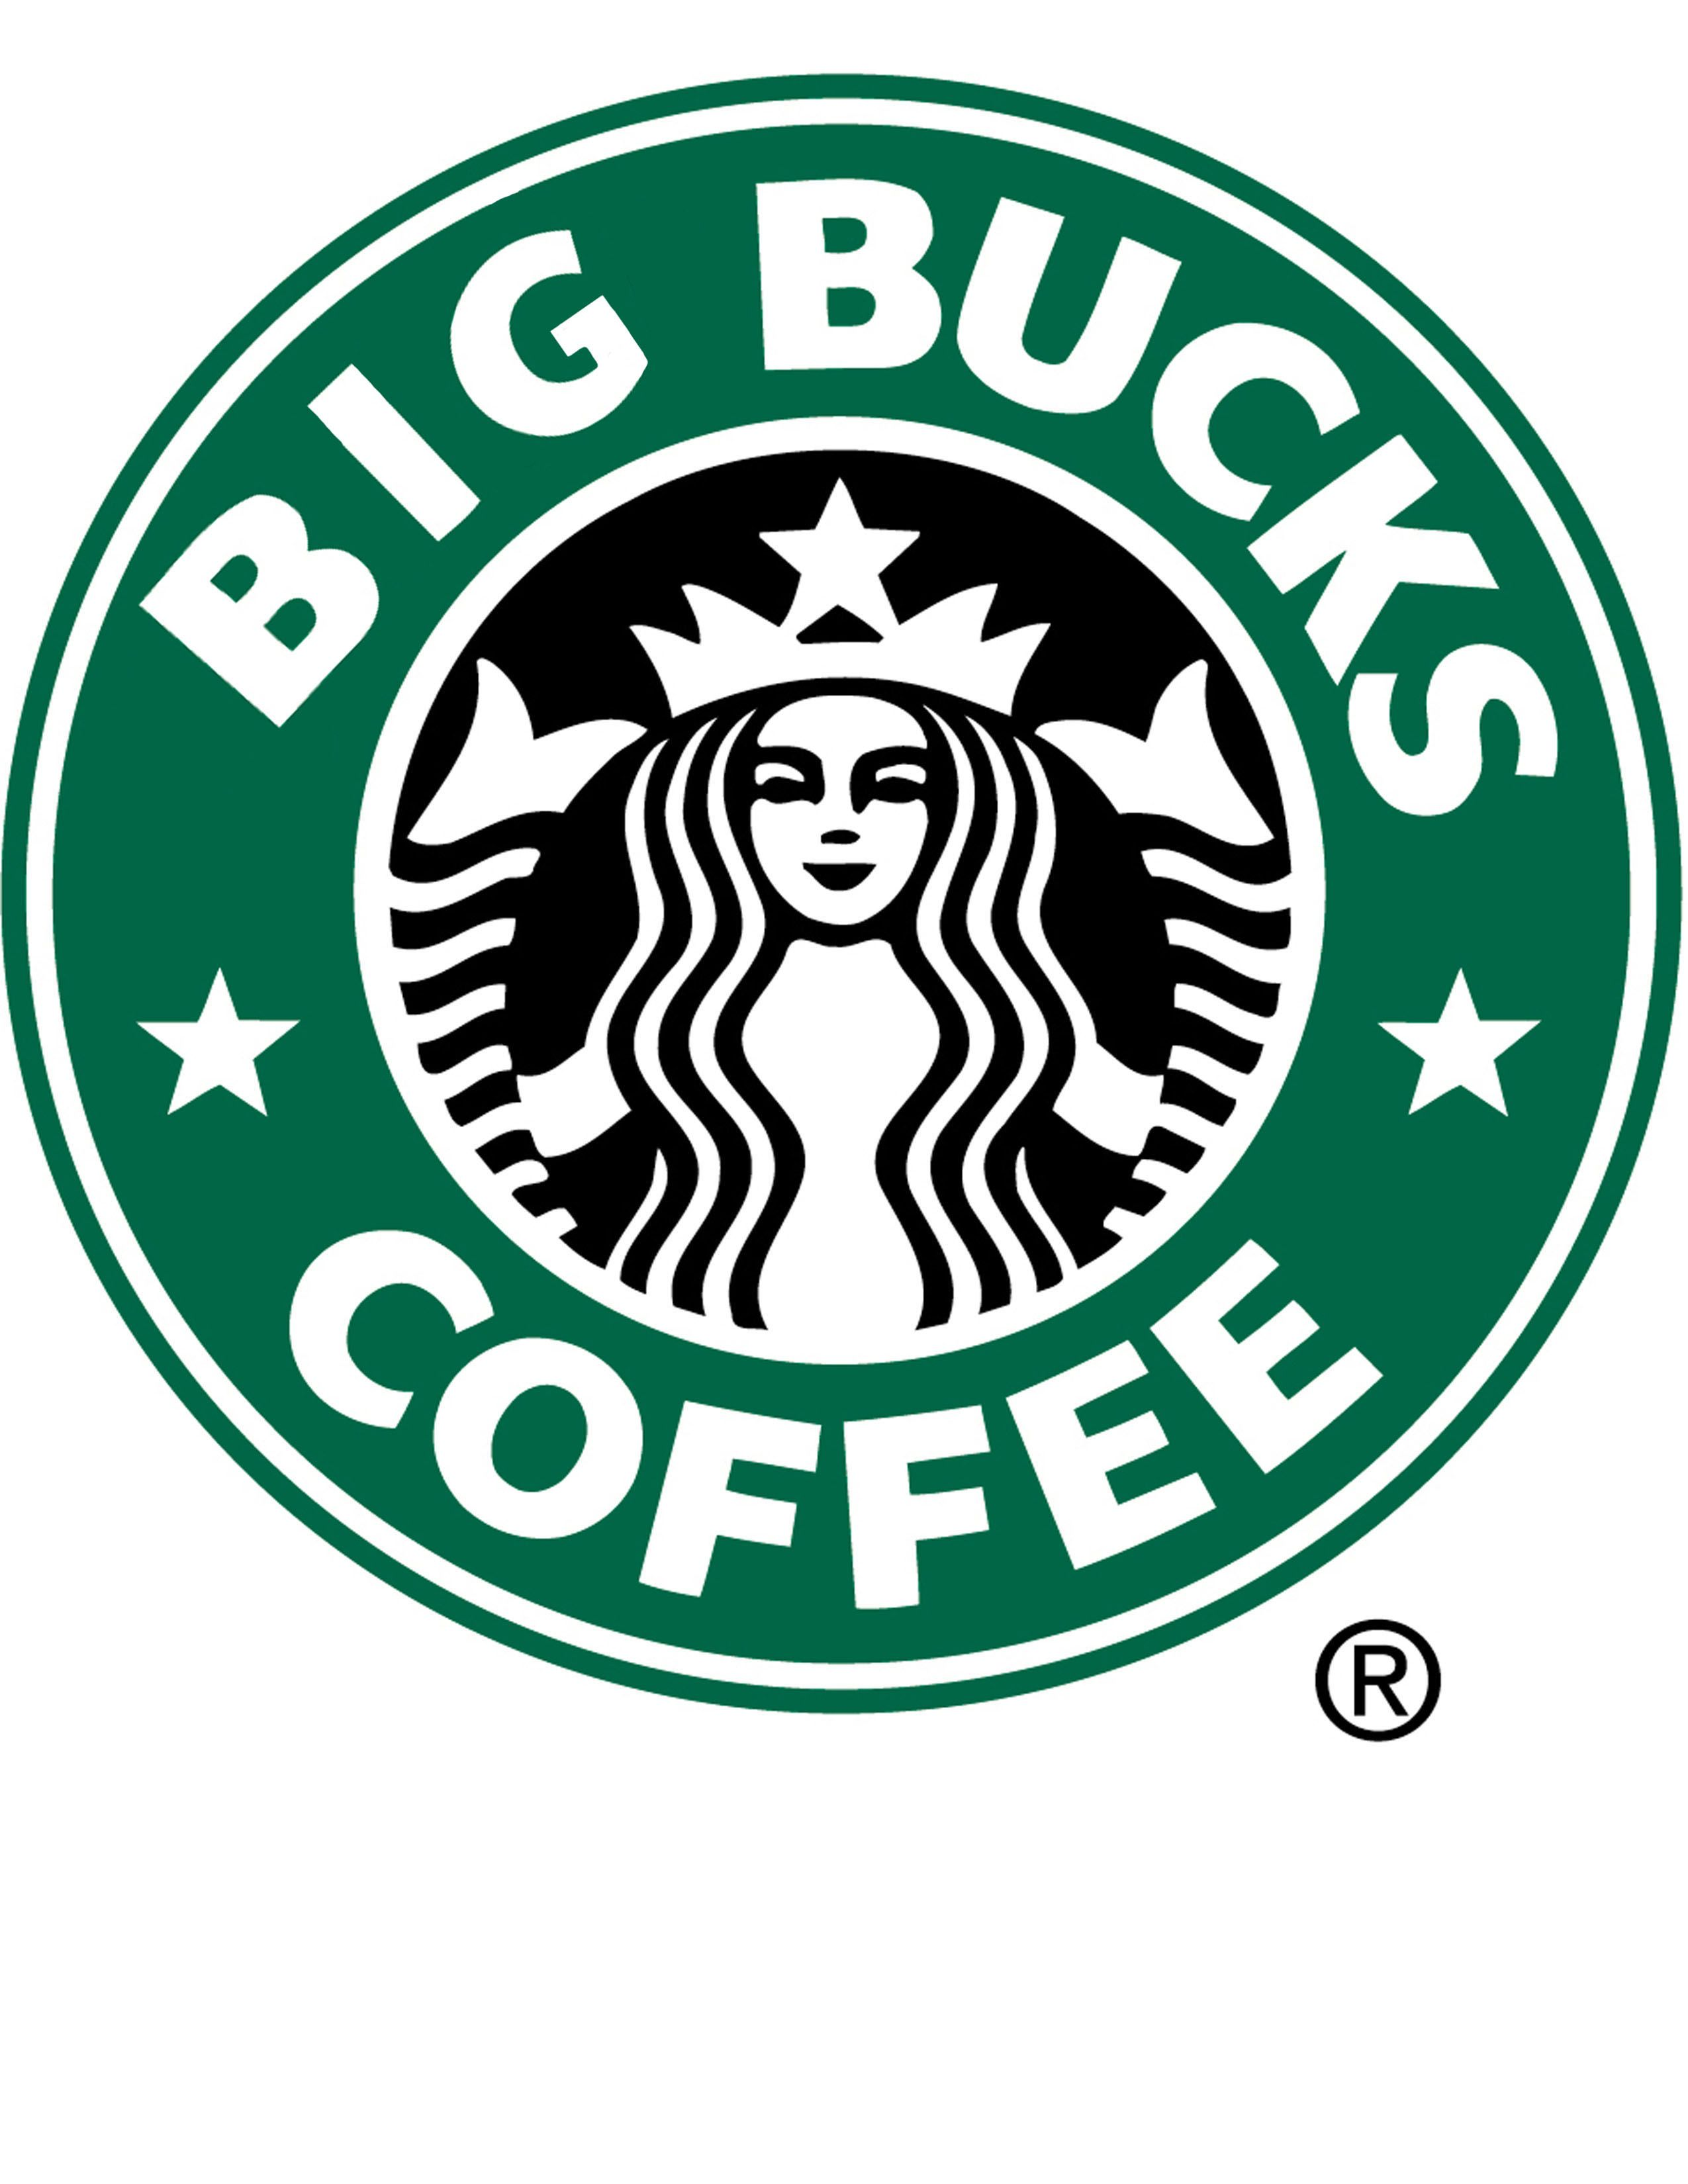 Starbucks logo starbucks pinterest starbucks logo starbucks logo biocorpaavc Image collections